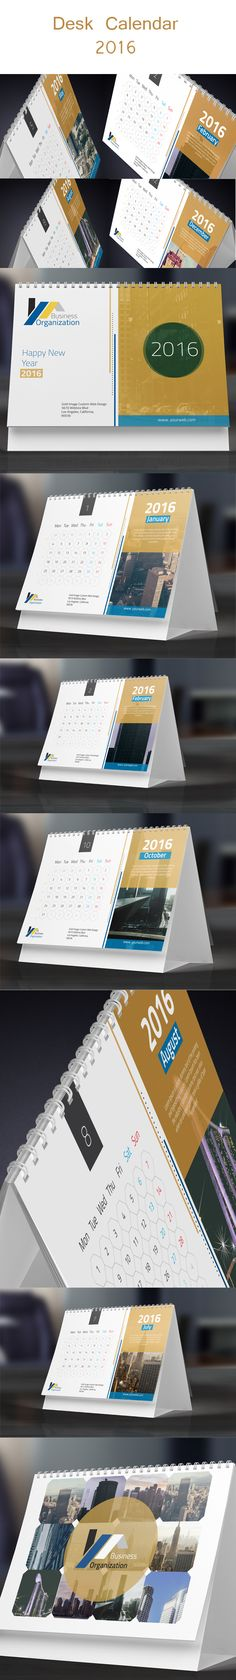 Desk Calendar 2016 on Behance